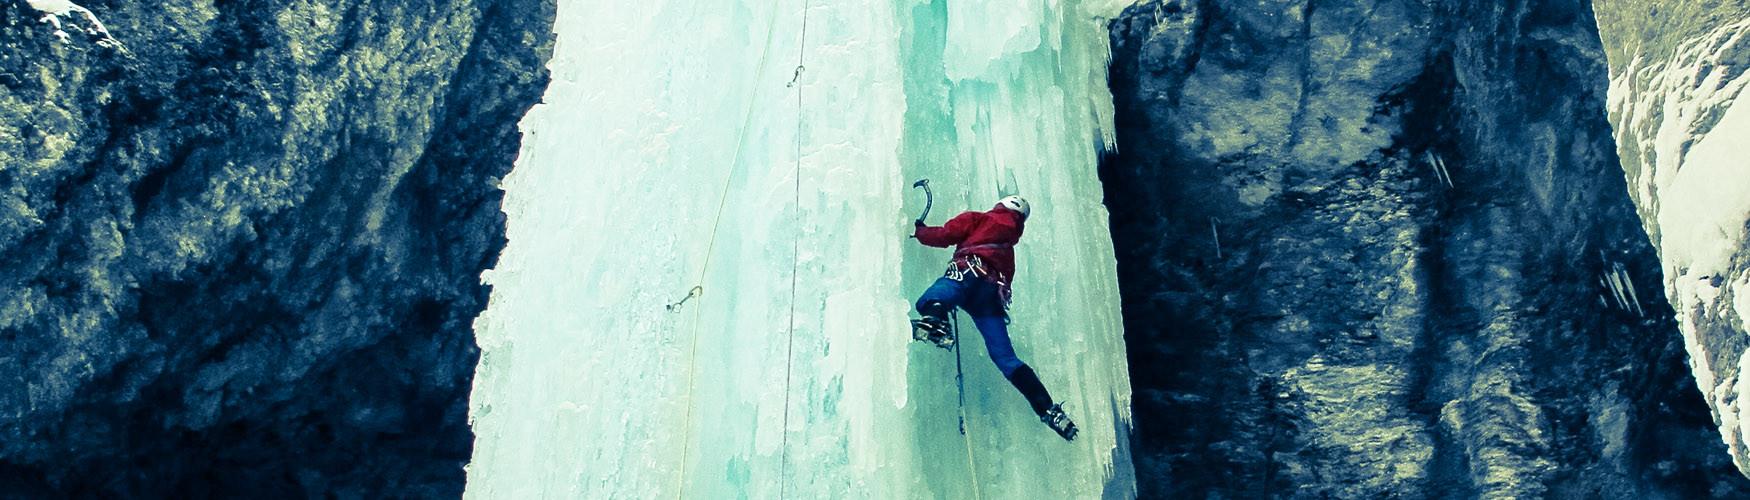 Grundkurs Eisklettern Bergführer